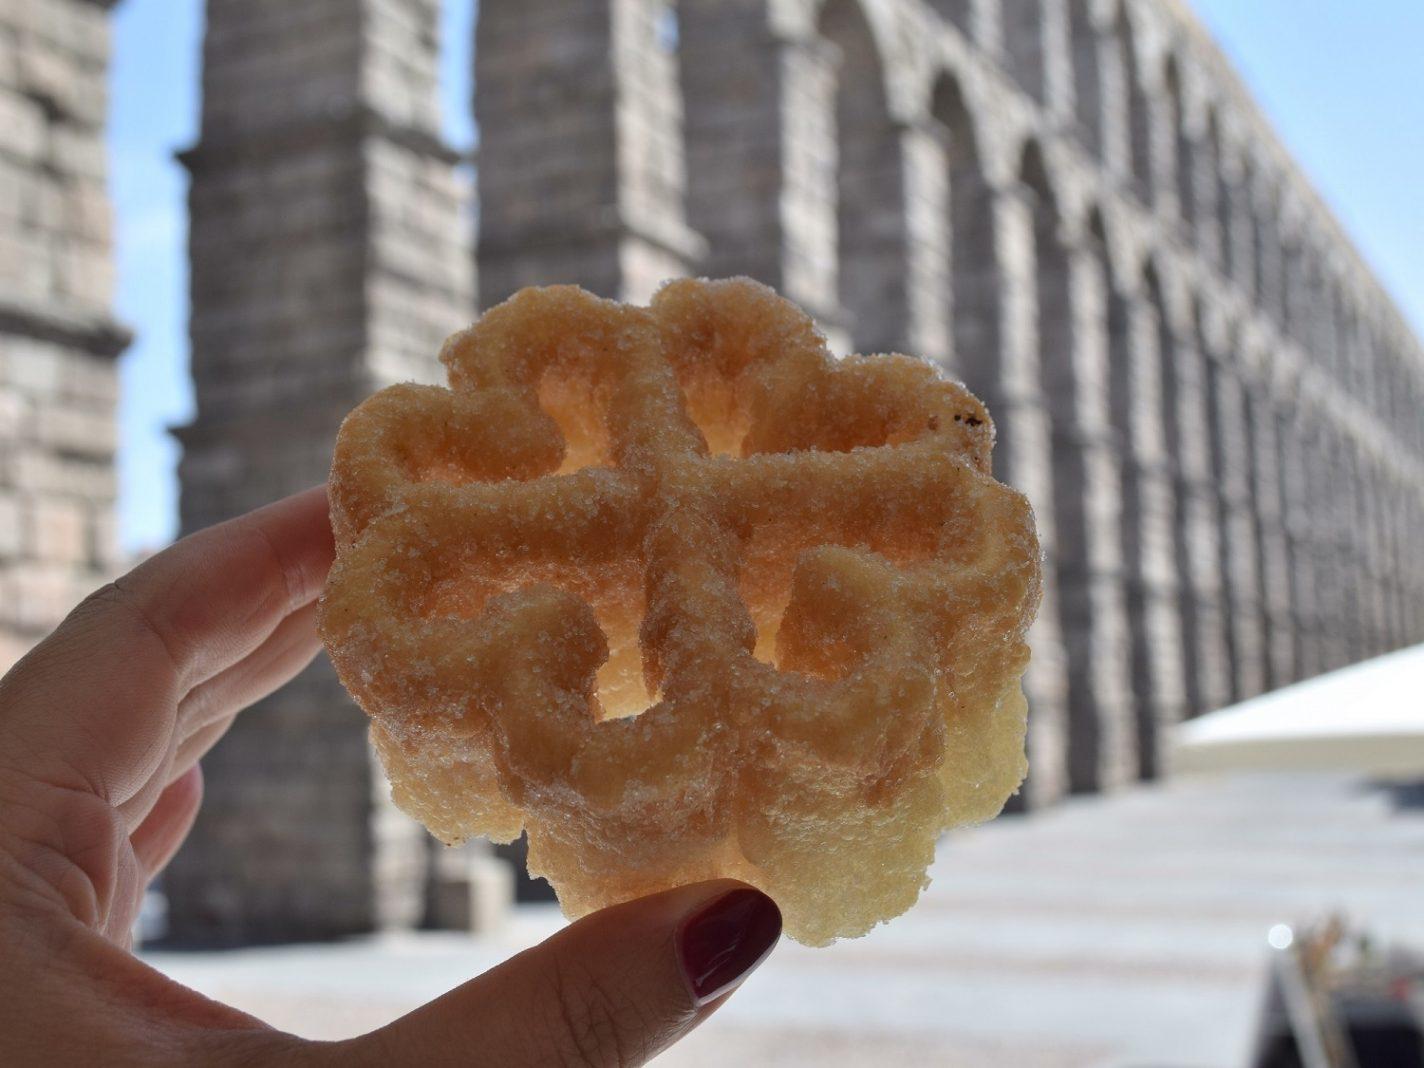 Favoriete foto van Helena - bros koekje in Segovia in Spanje - Interview met Helena van Eating Habits